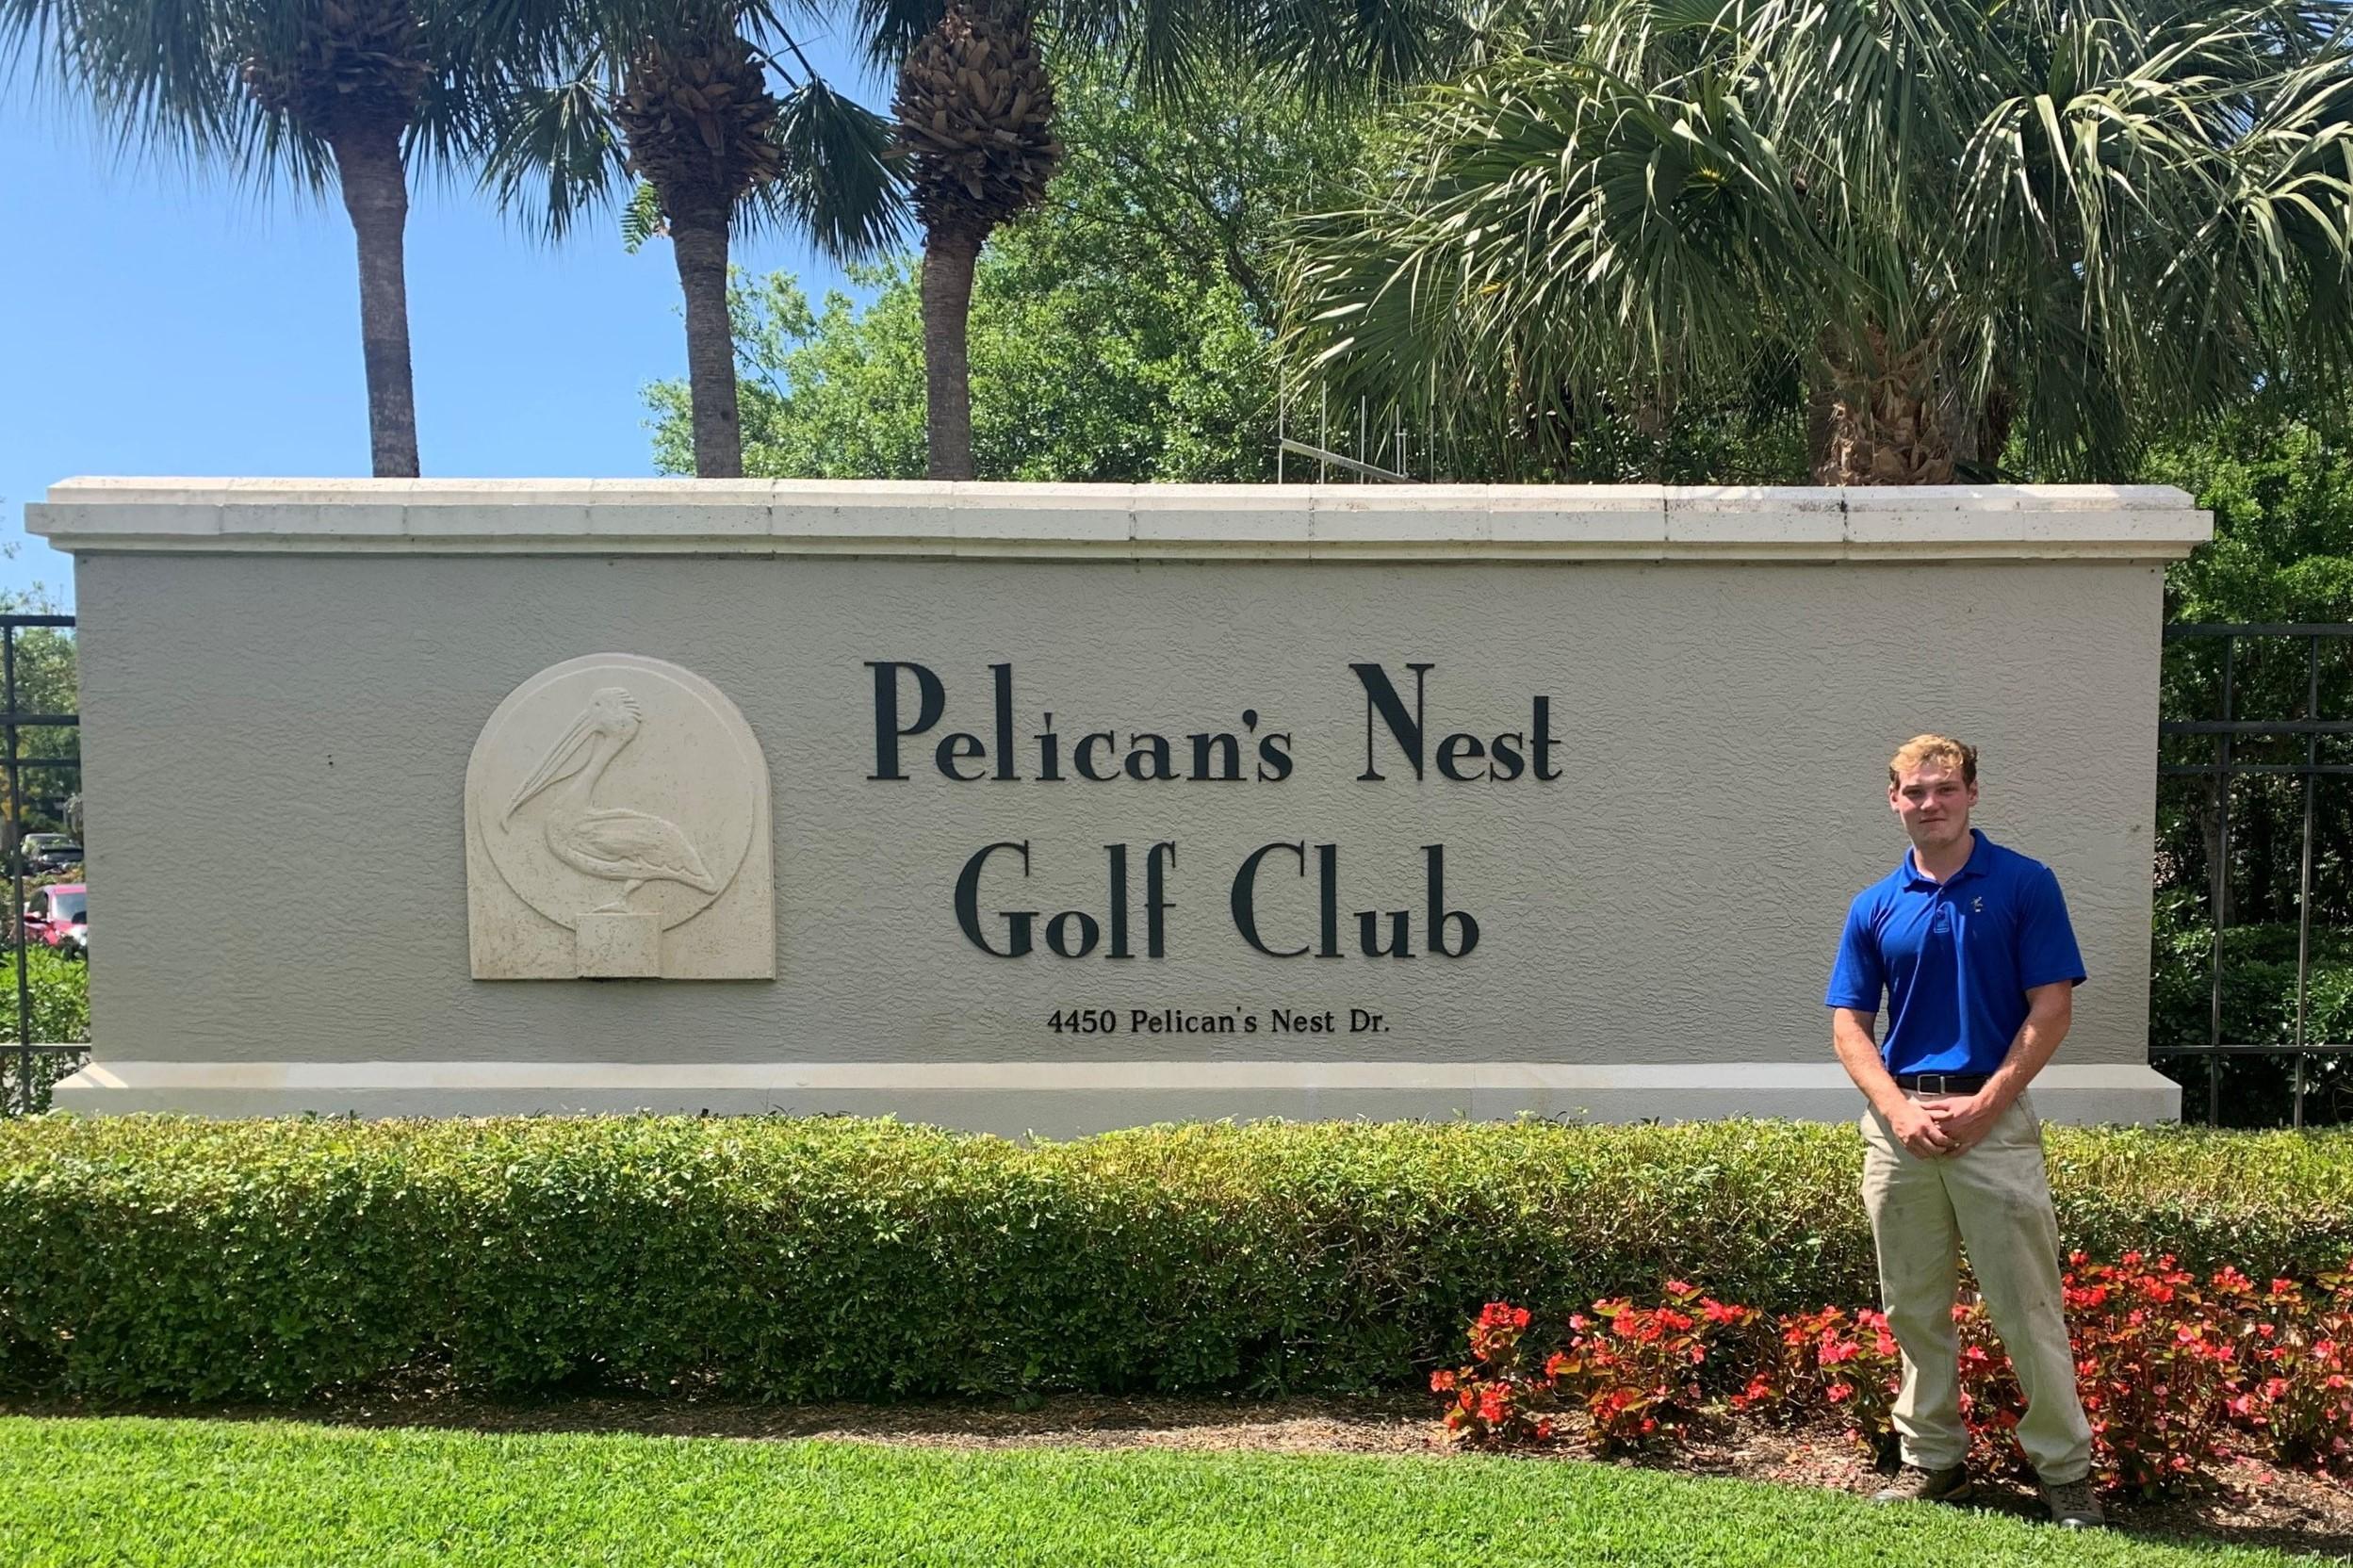 Jackson-Severns-Pelicans-Nest-Golf-Club-sign-crop